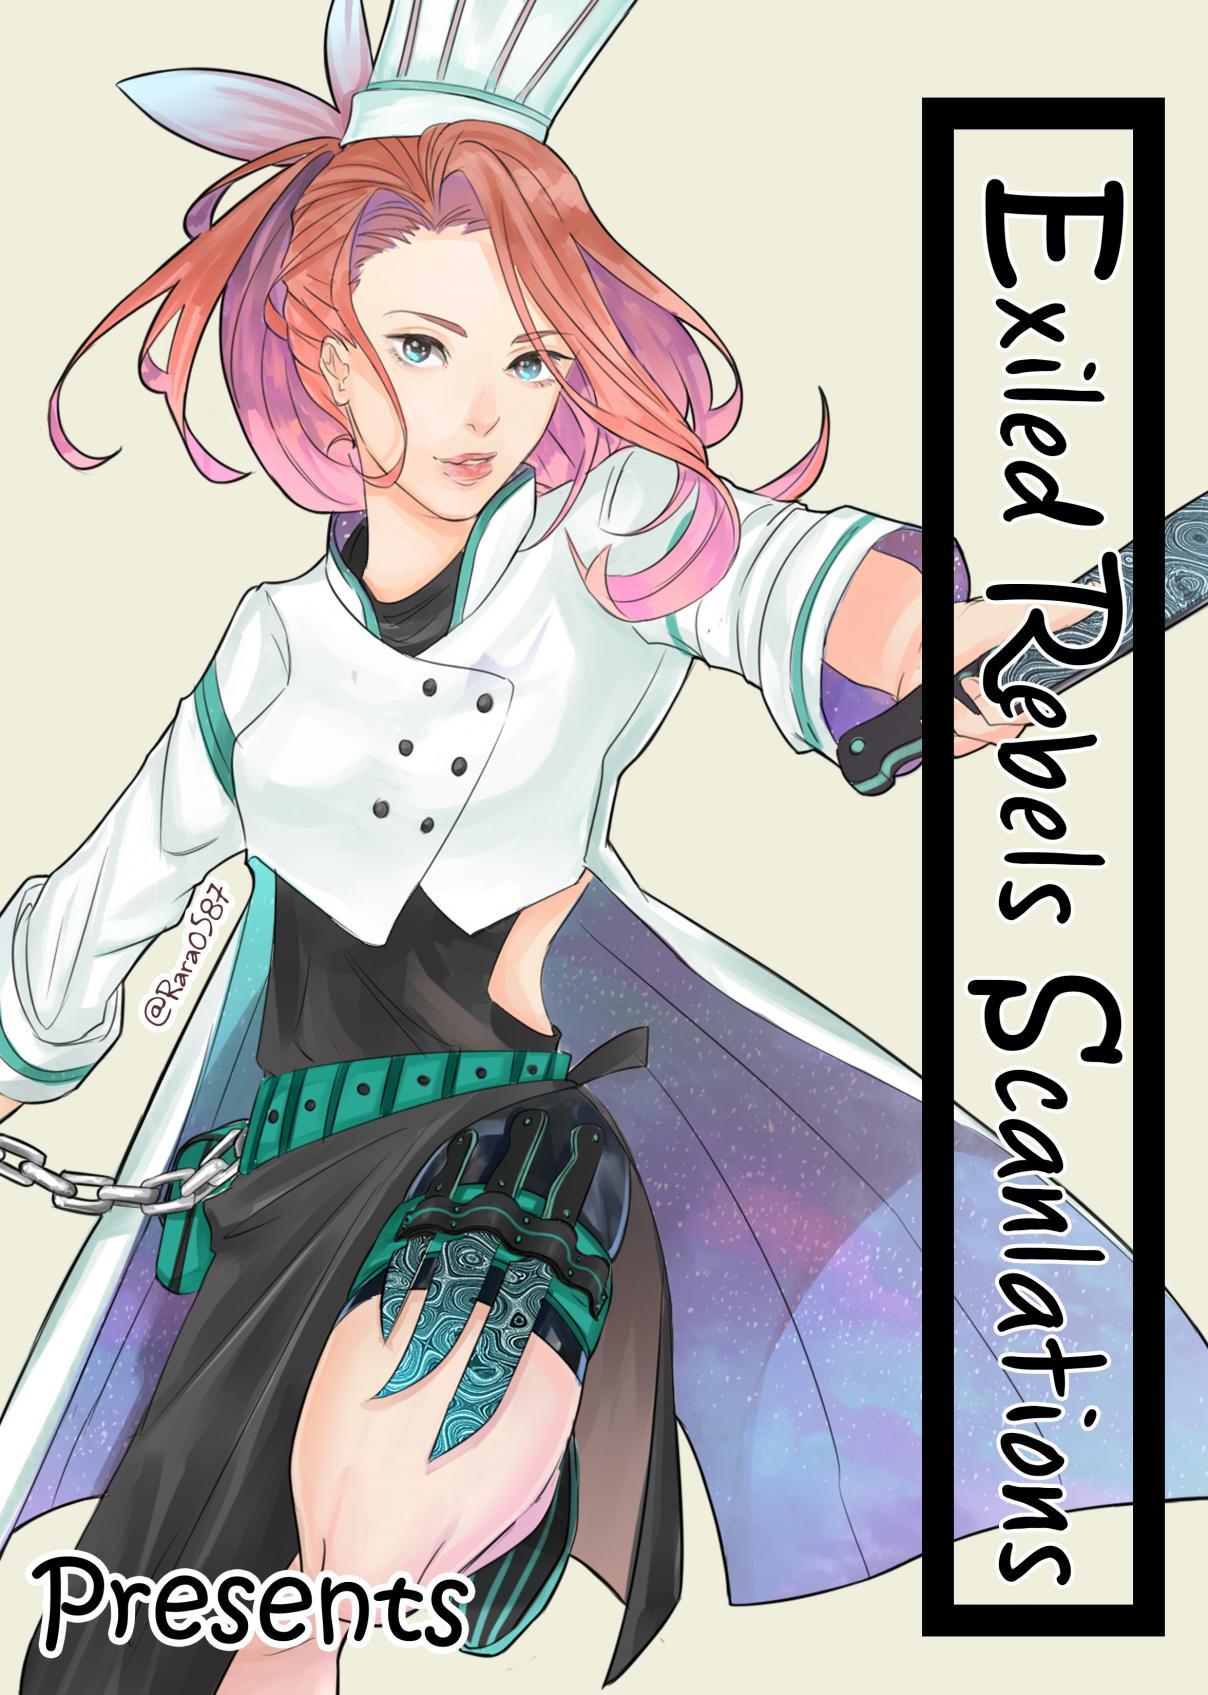 https://img2.nineanime.com/comics/pic2/52/16116/844387/0e2f55a256a7218367349b9e87657252.jpg Page 1